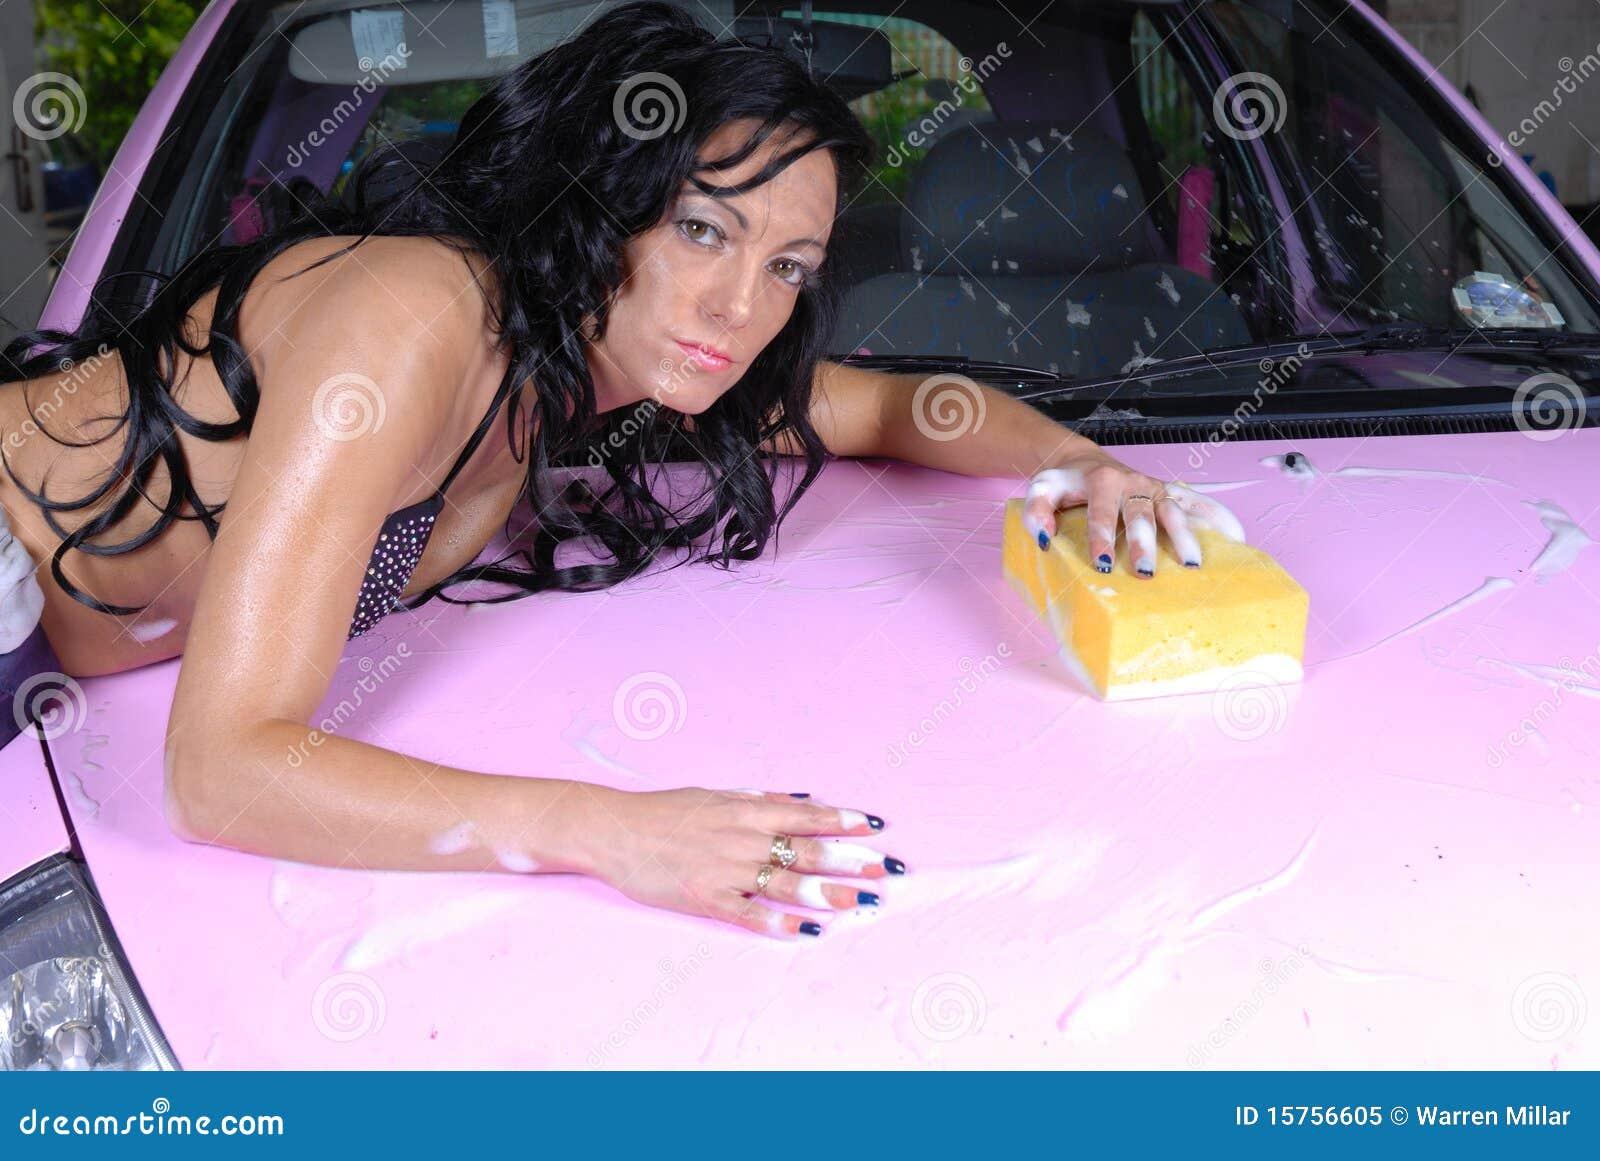 Bikini girls washing cars sorry, does not